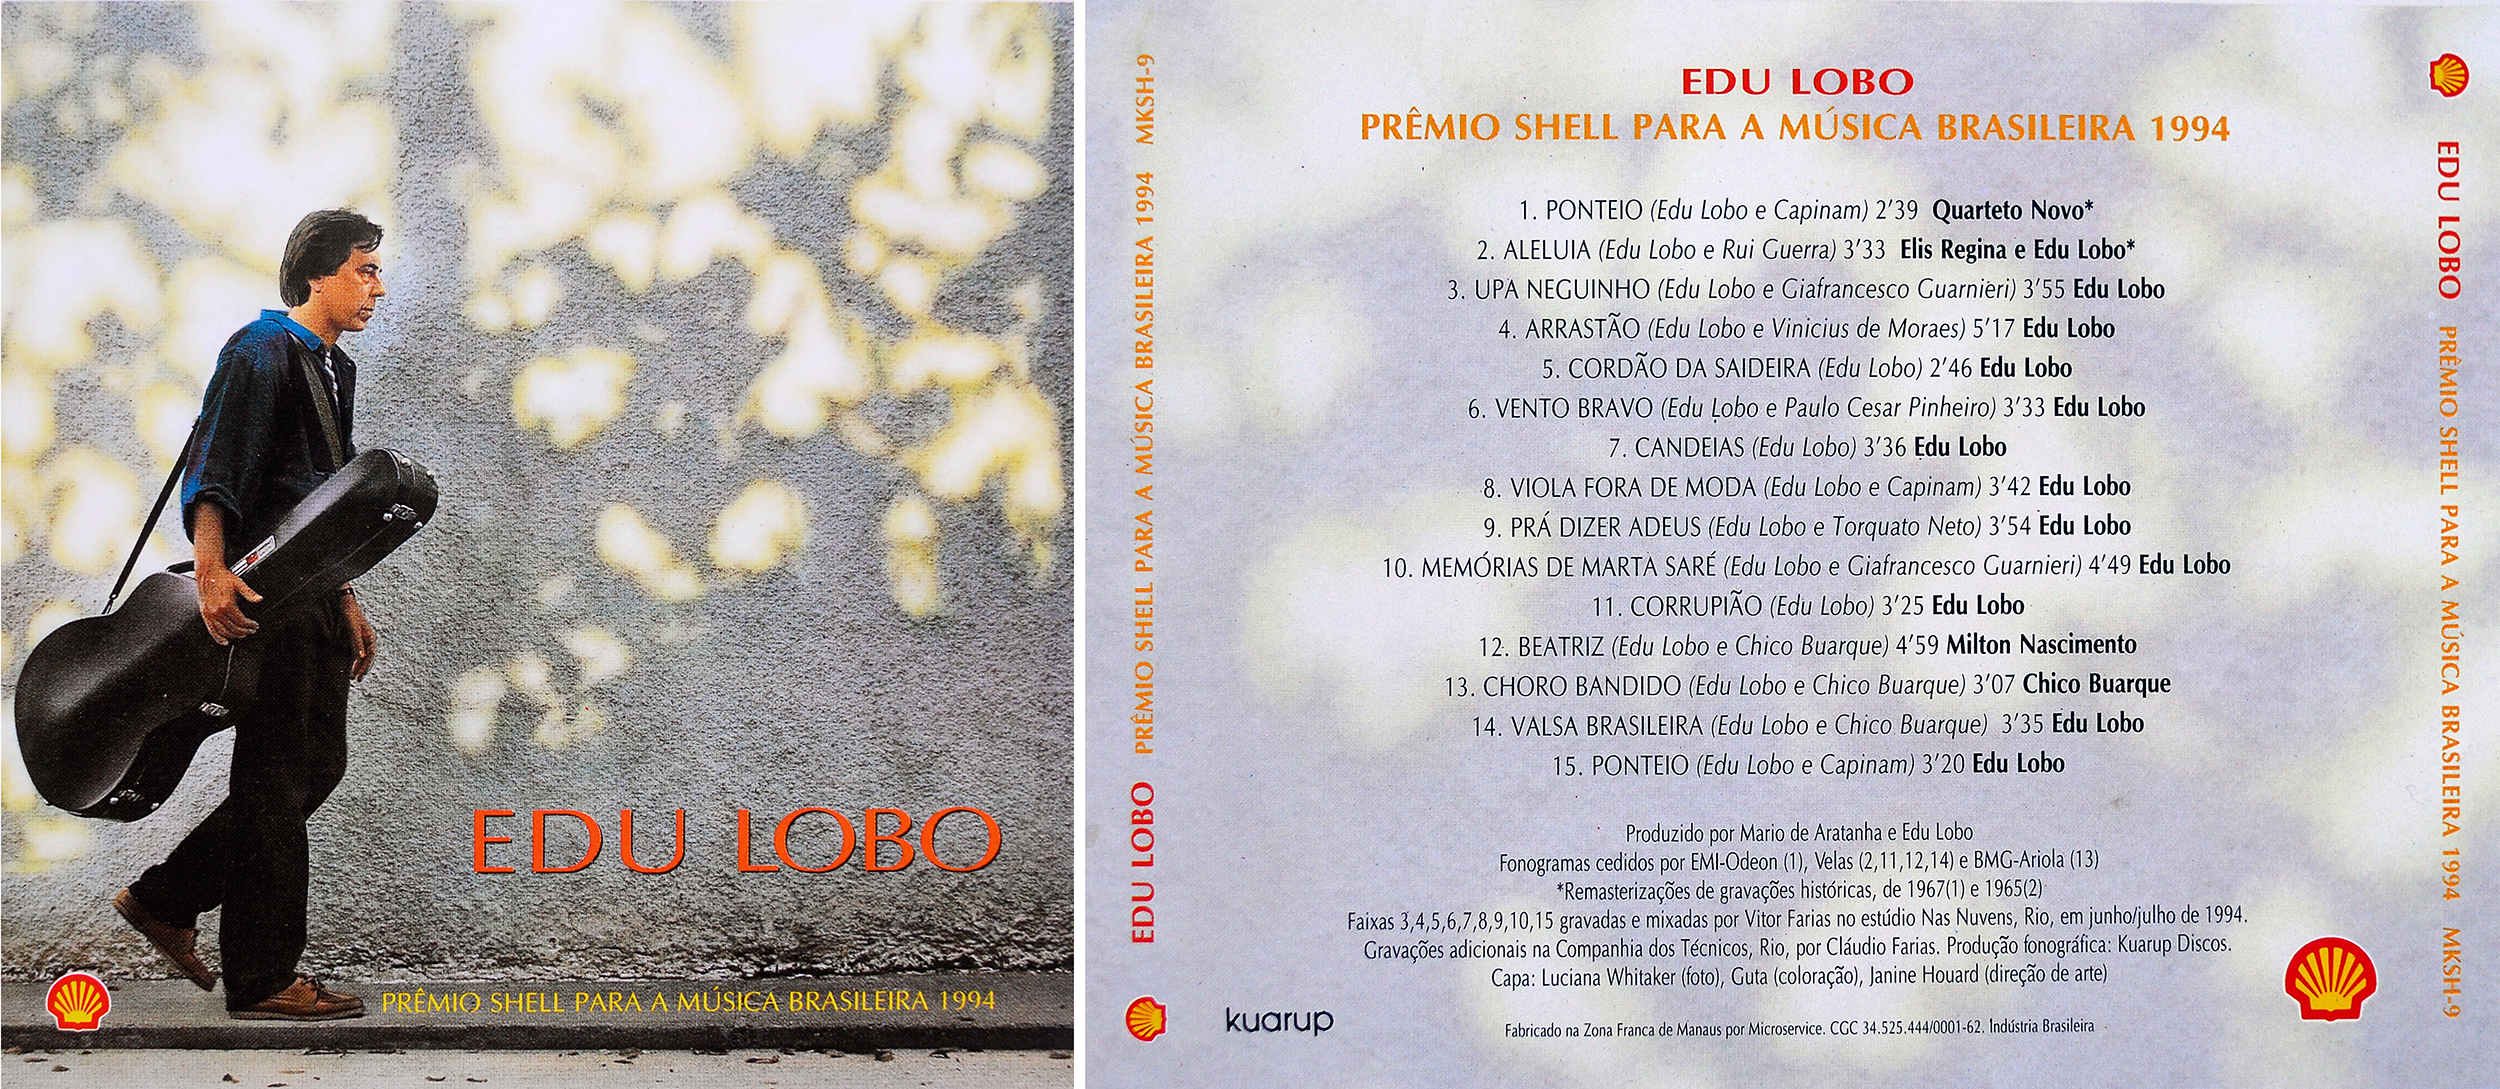 CD Edu Lobo, Brazil 1994